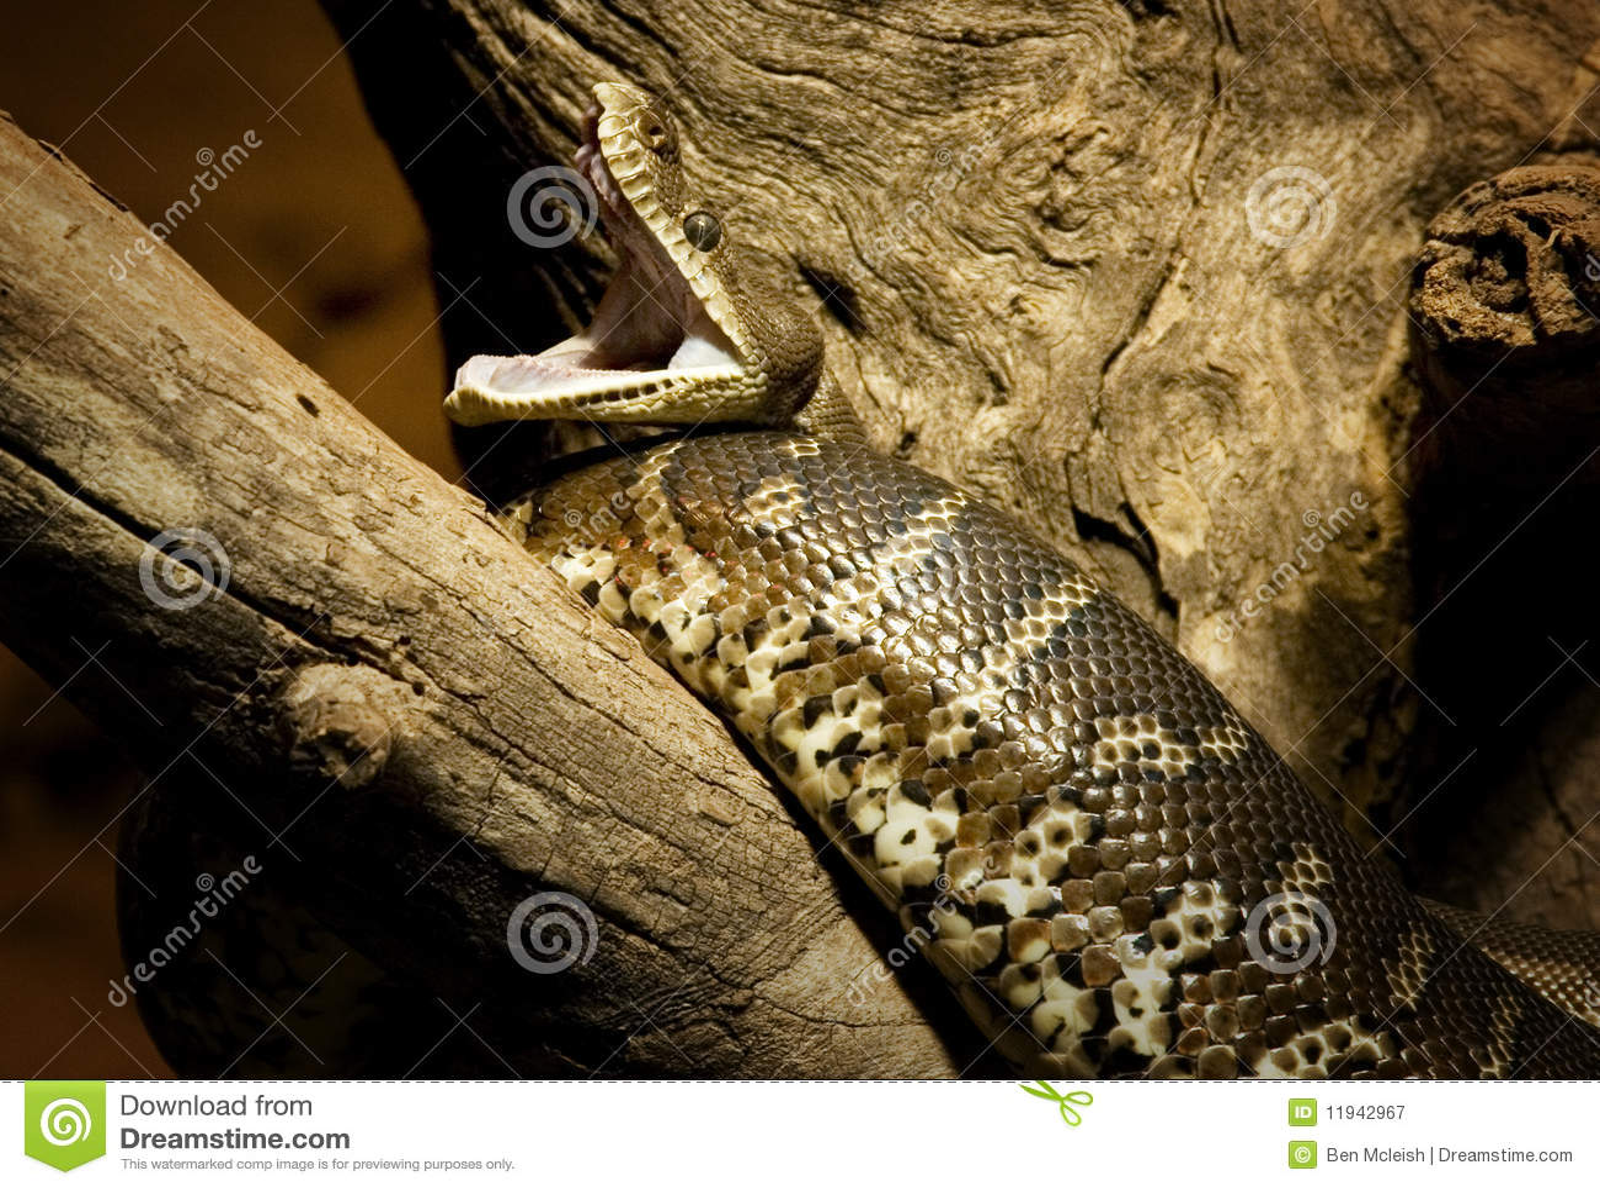 Python current date in Sydney